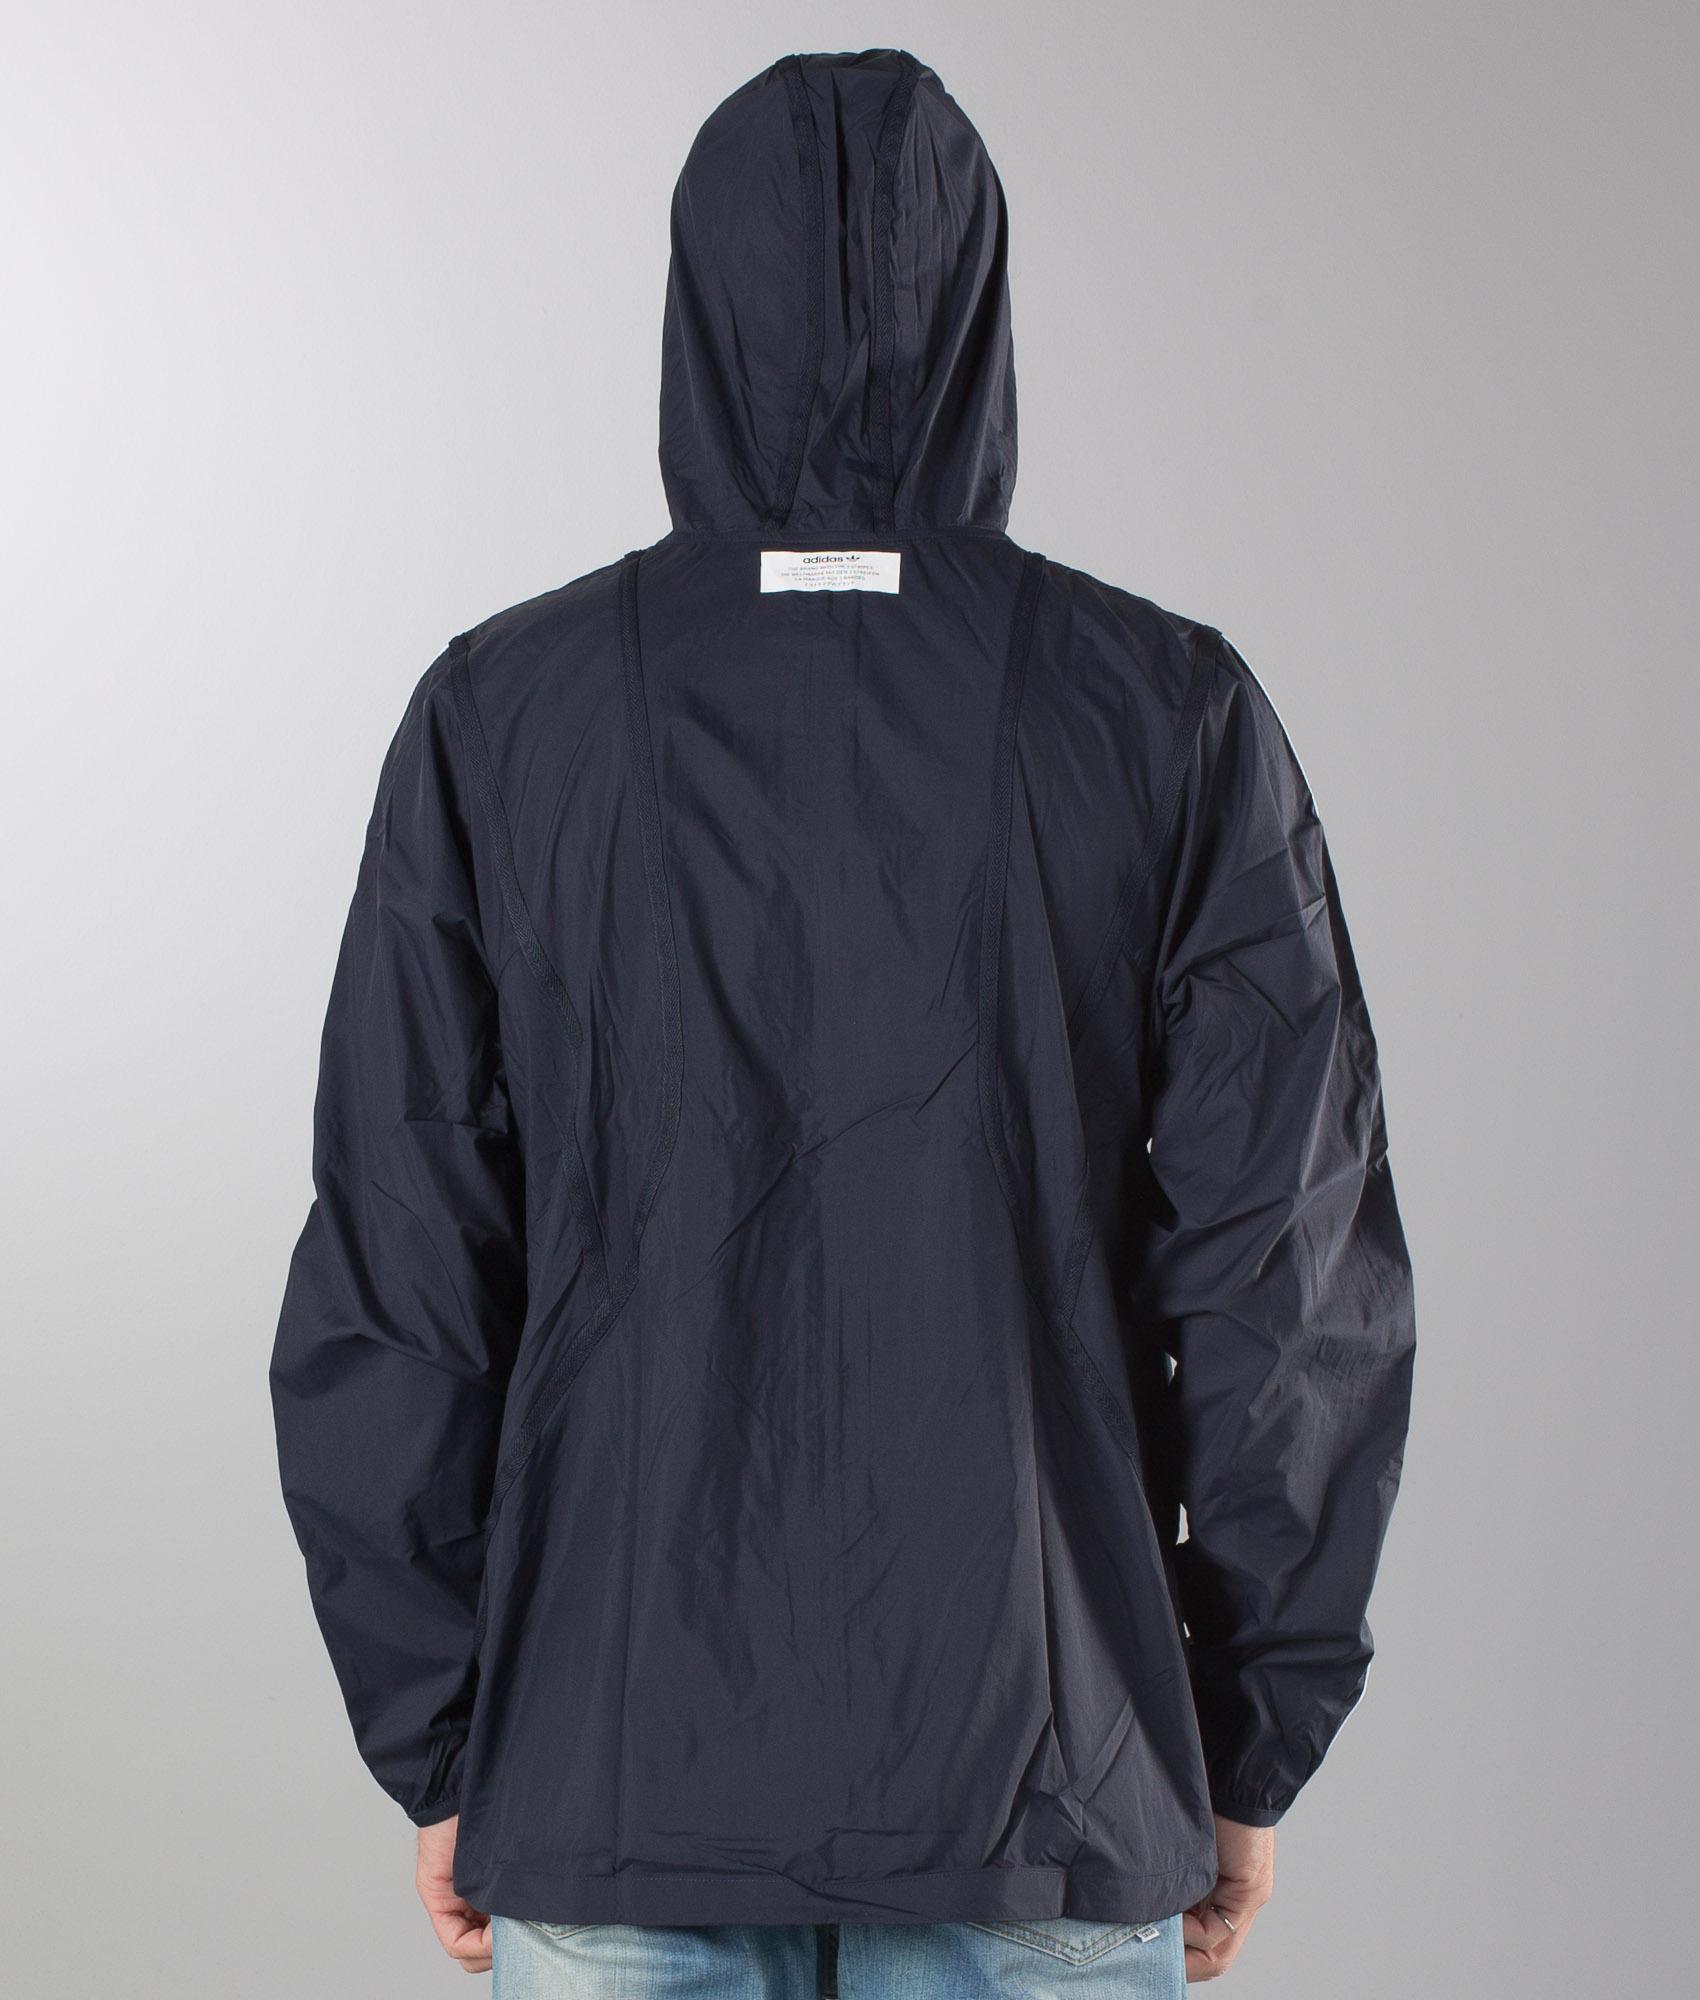 Adidas Originals Tko Clr84 Giacca LeginkWhite